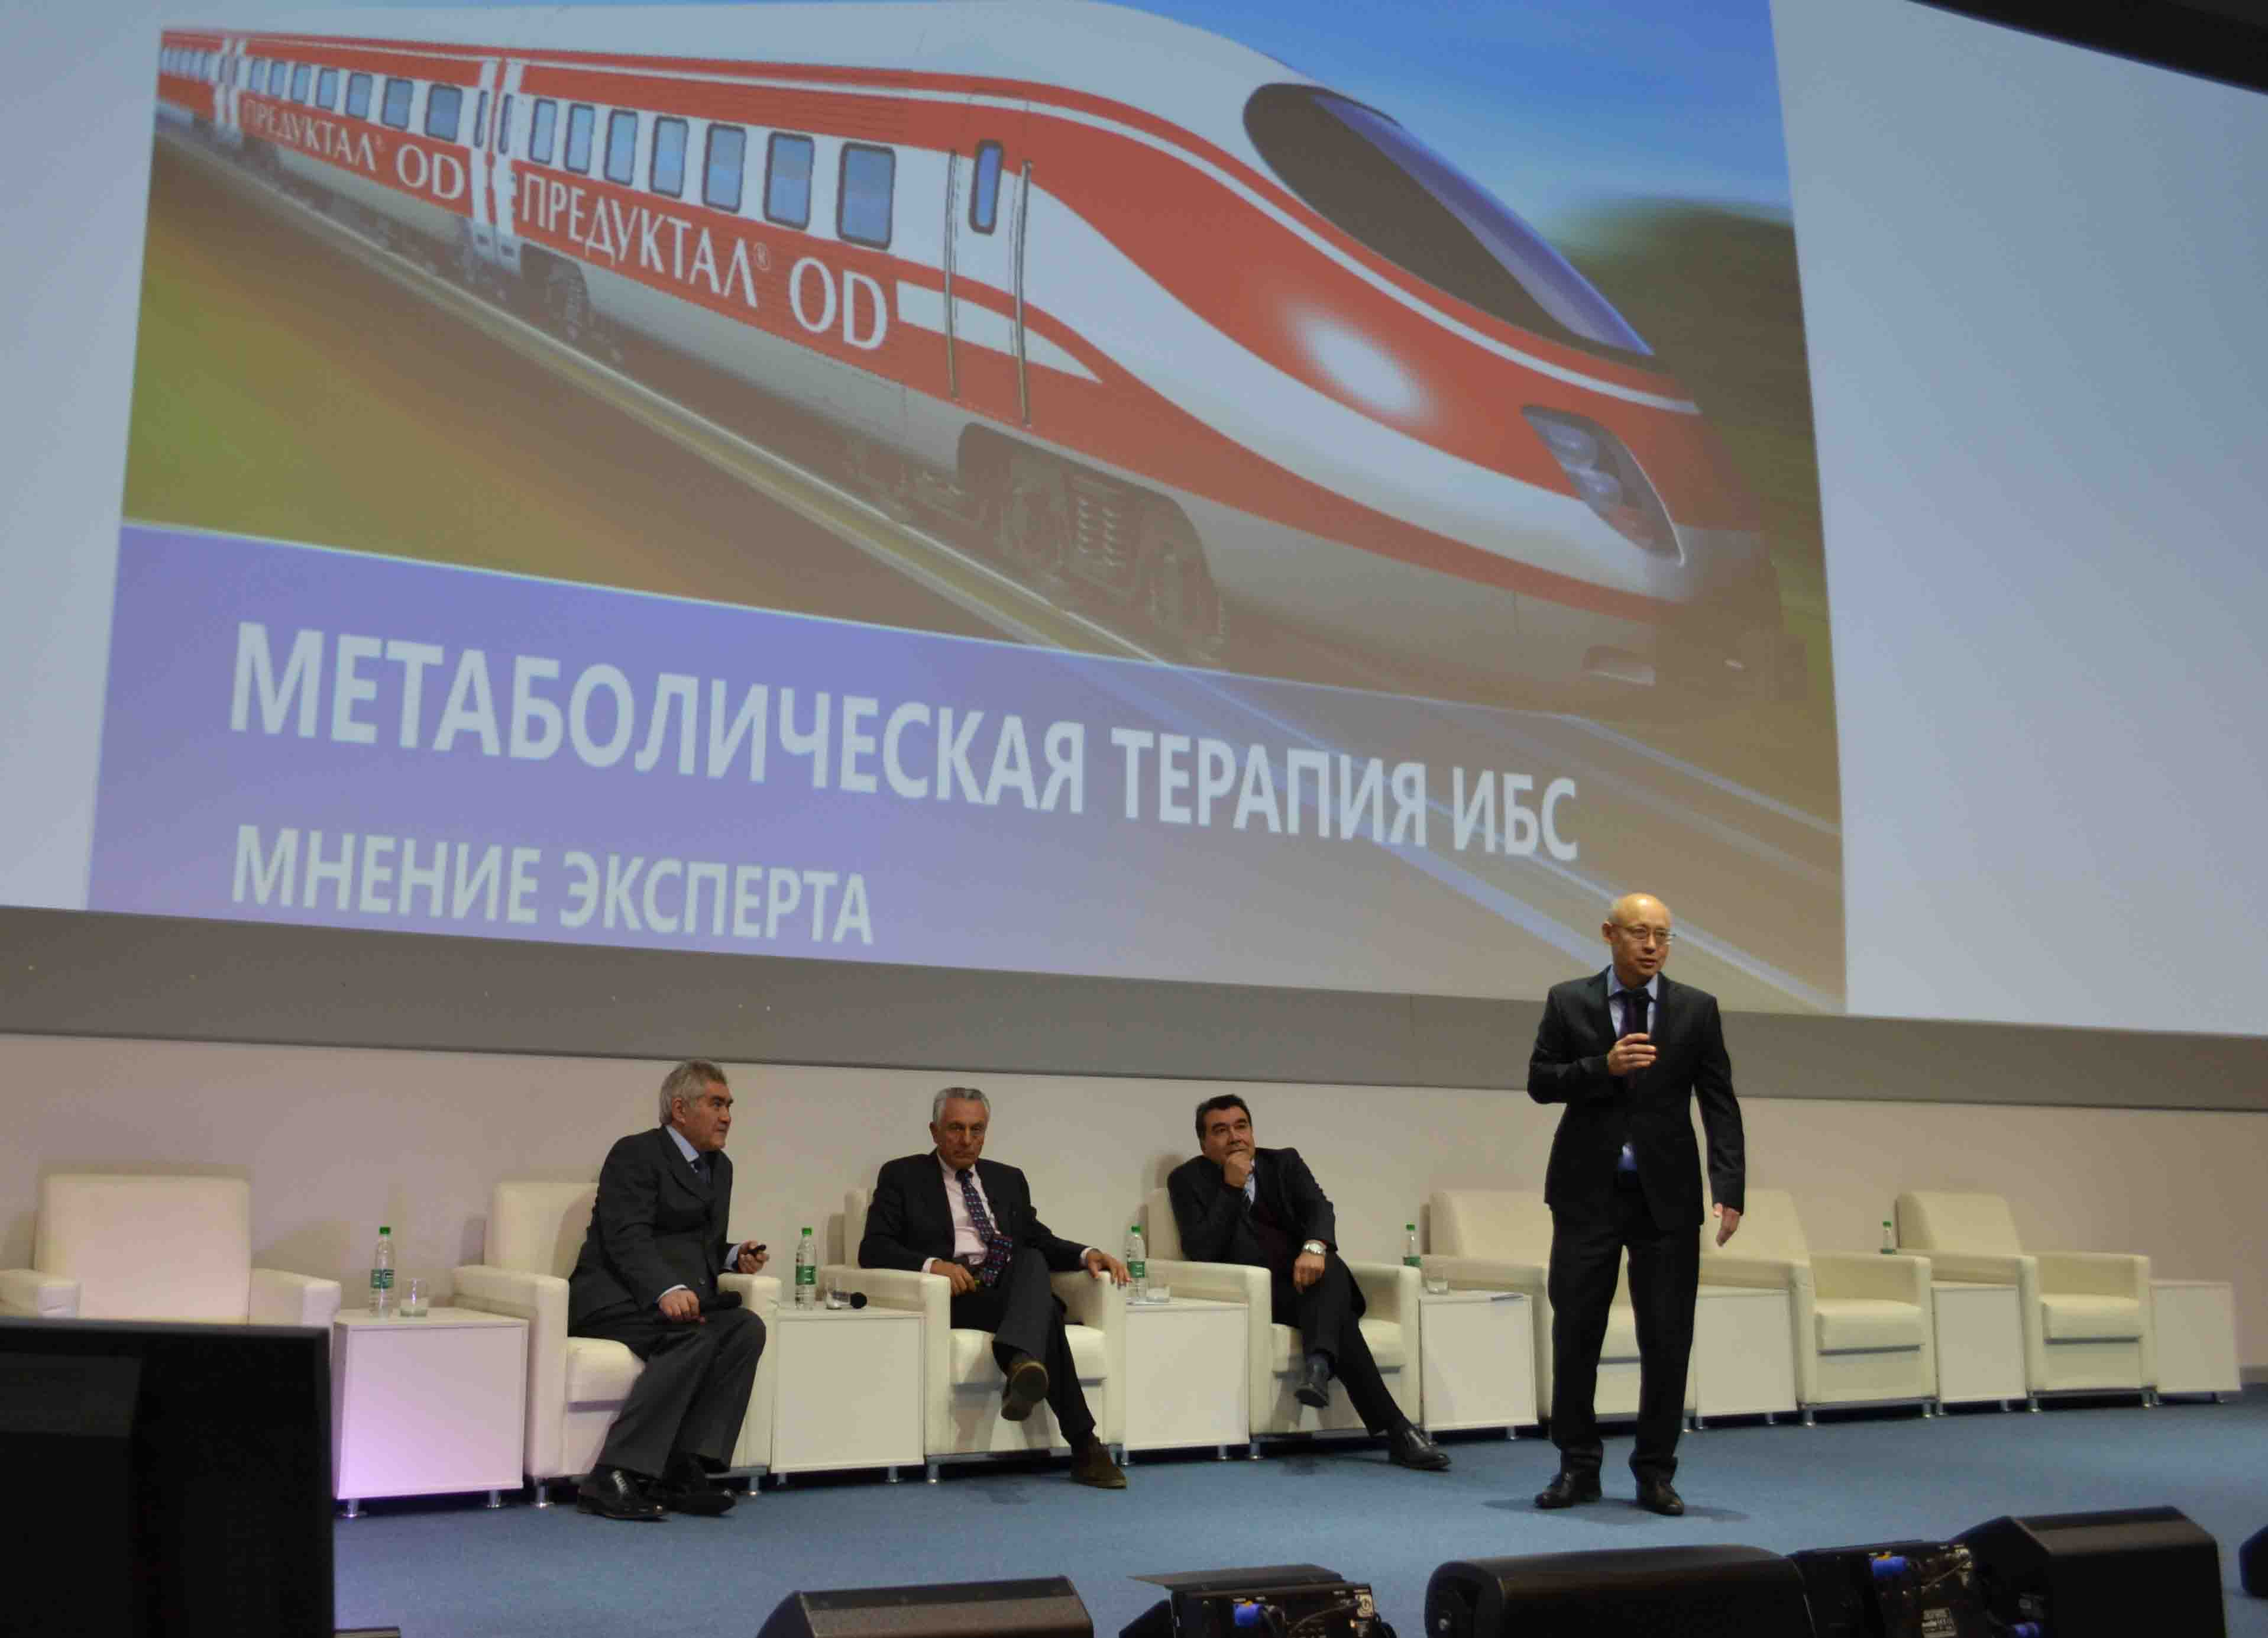 http://medicalexpress.ru/uploads/reportss/DSC_0031.jpg